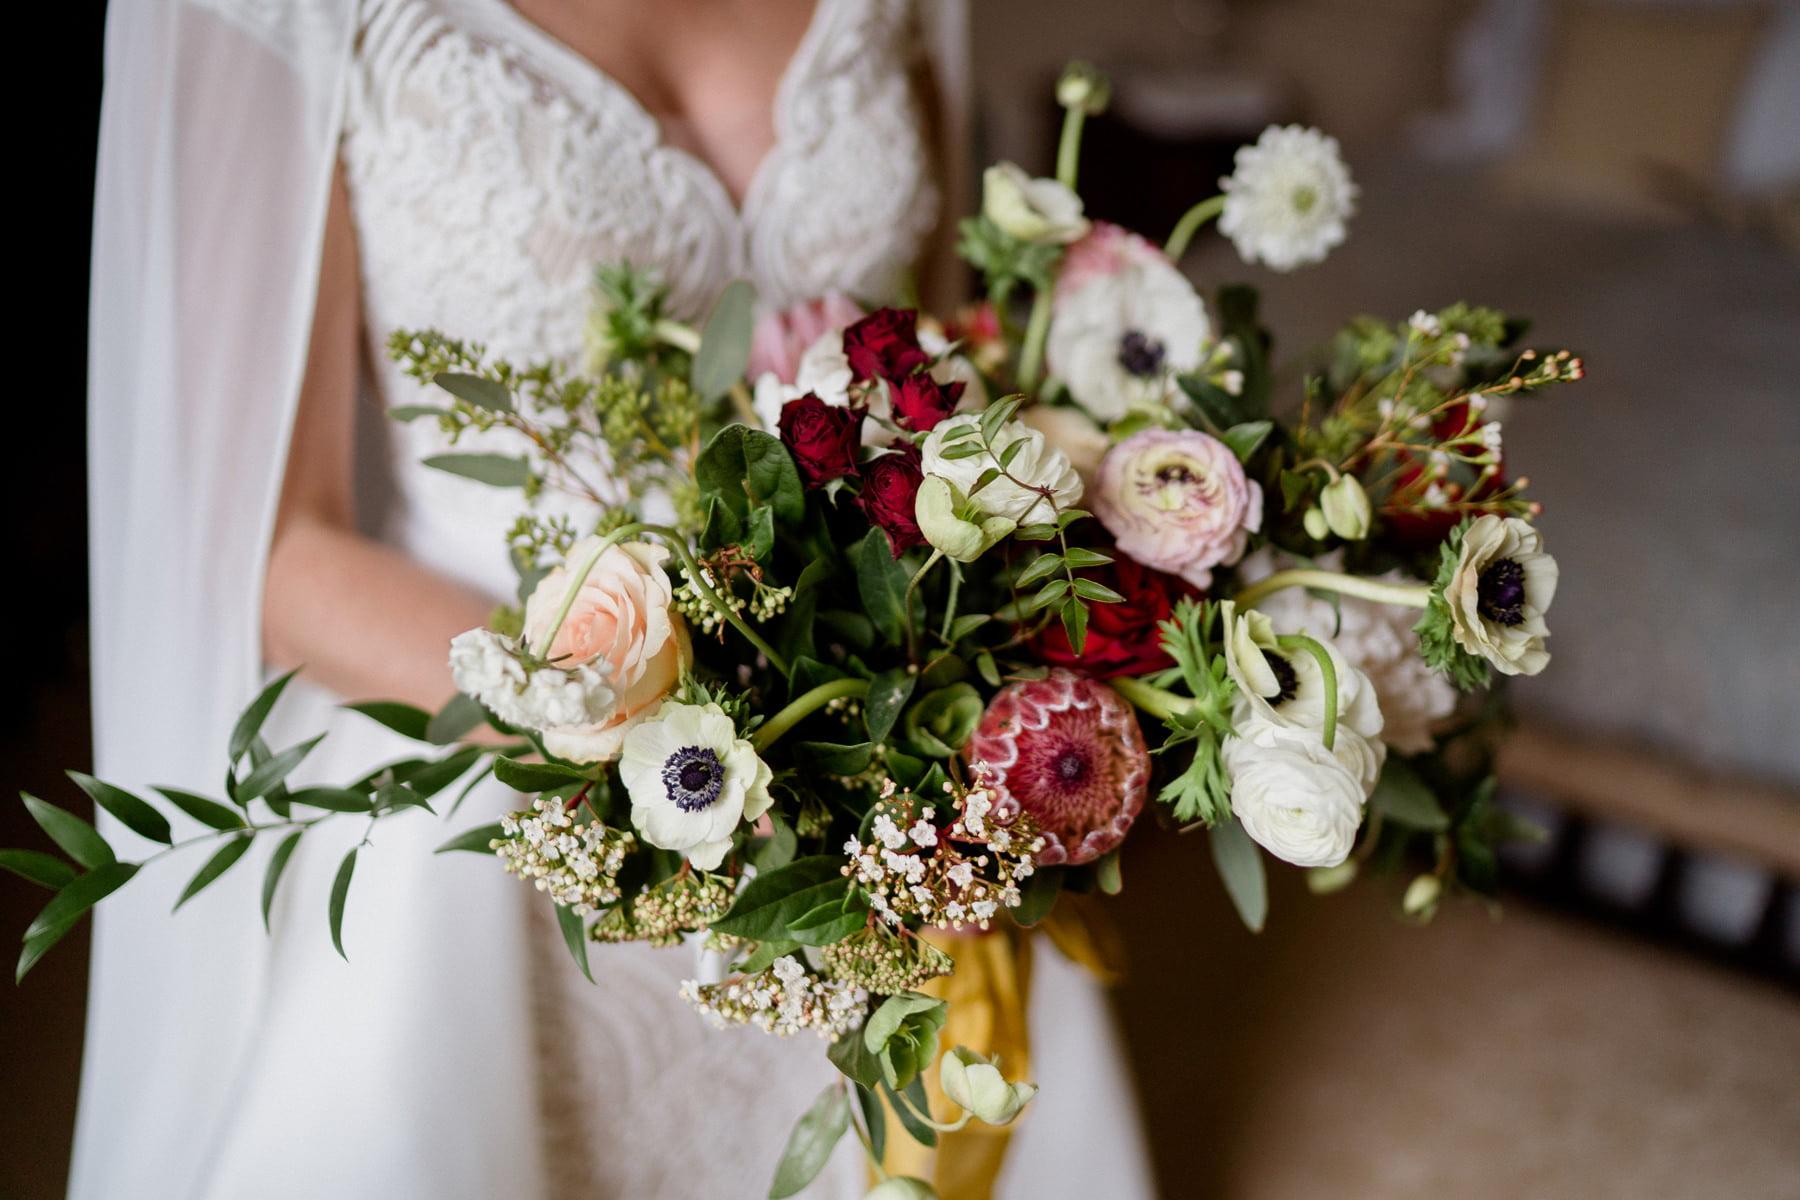 Cloughjordan House Winter Wedding flowers details